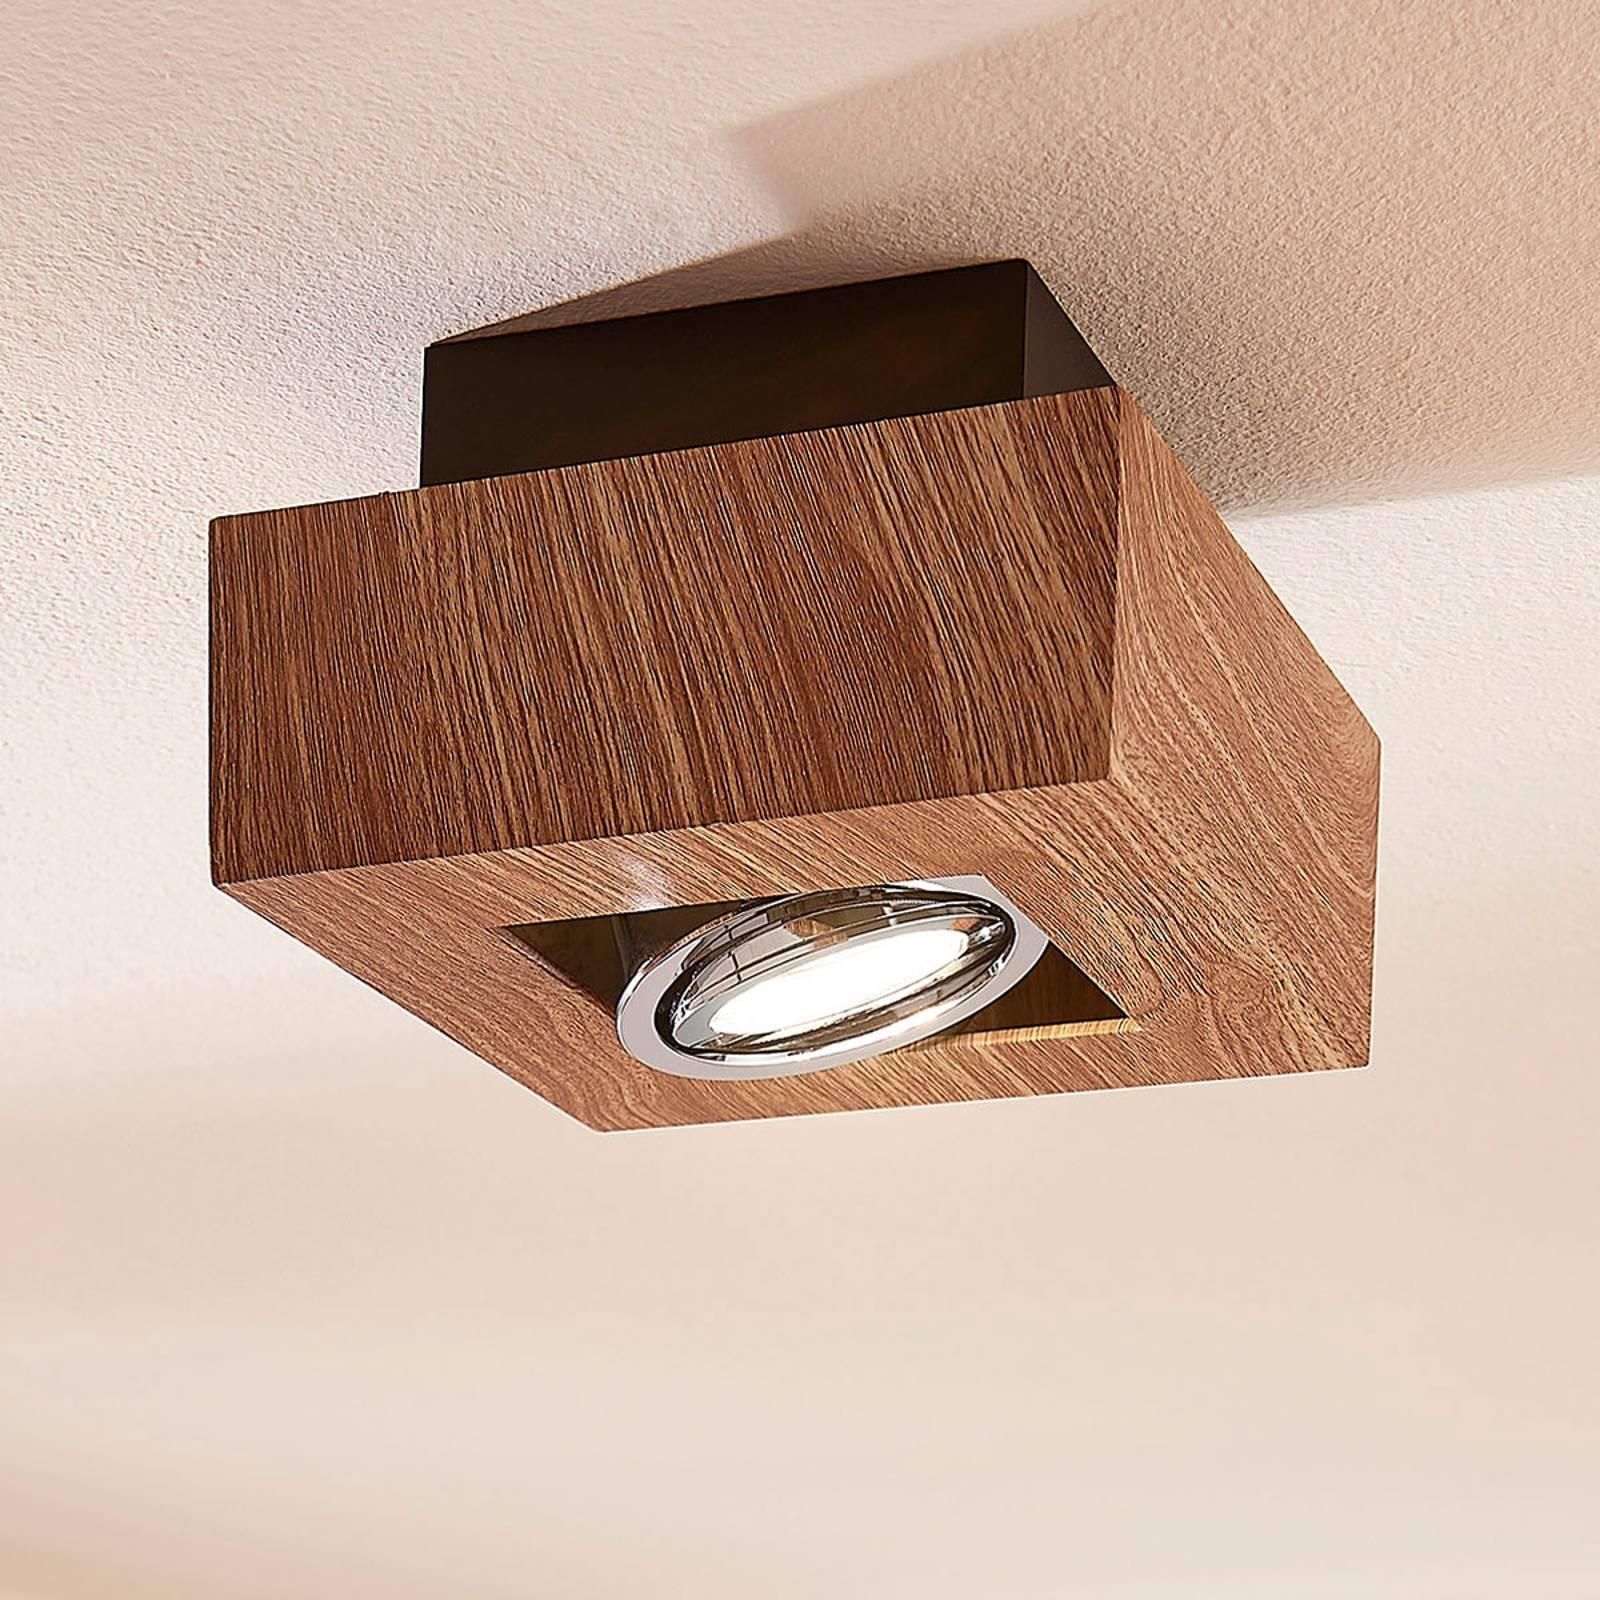 LED-kattolamppu Vince, 14 x 14 cm puuta